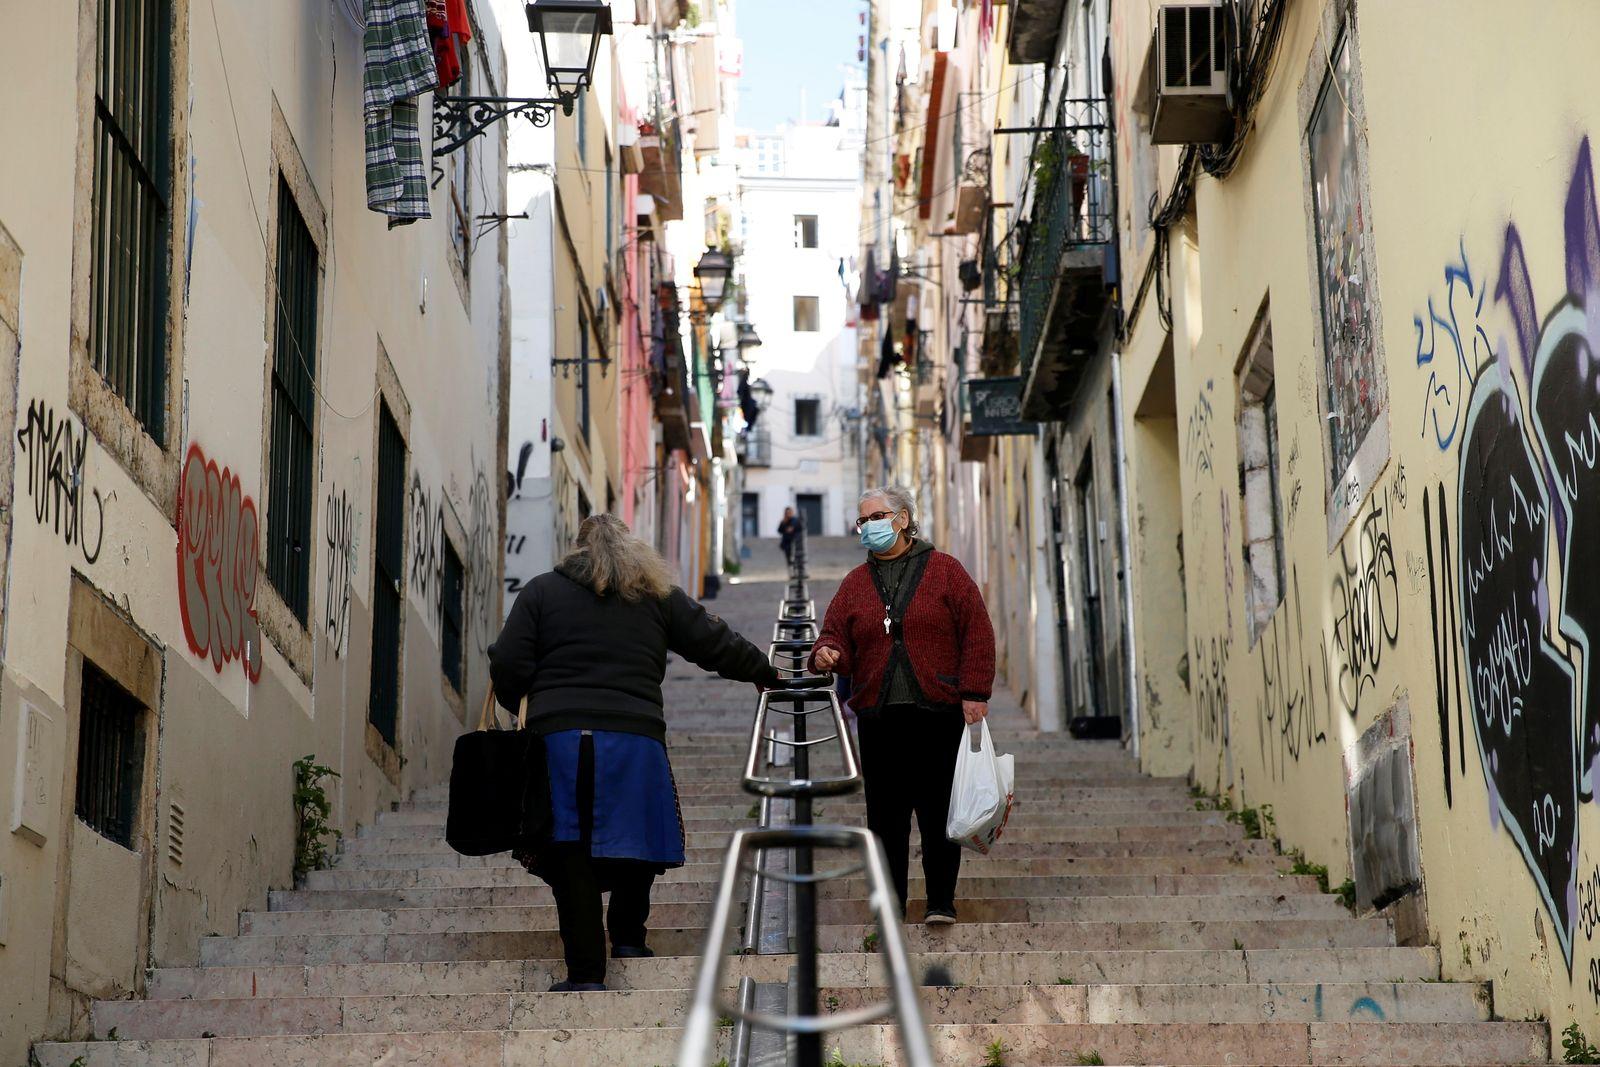 PM announces new COVID lockdown in Lisbon